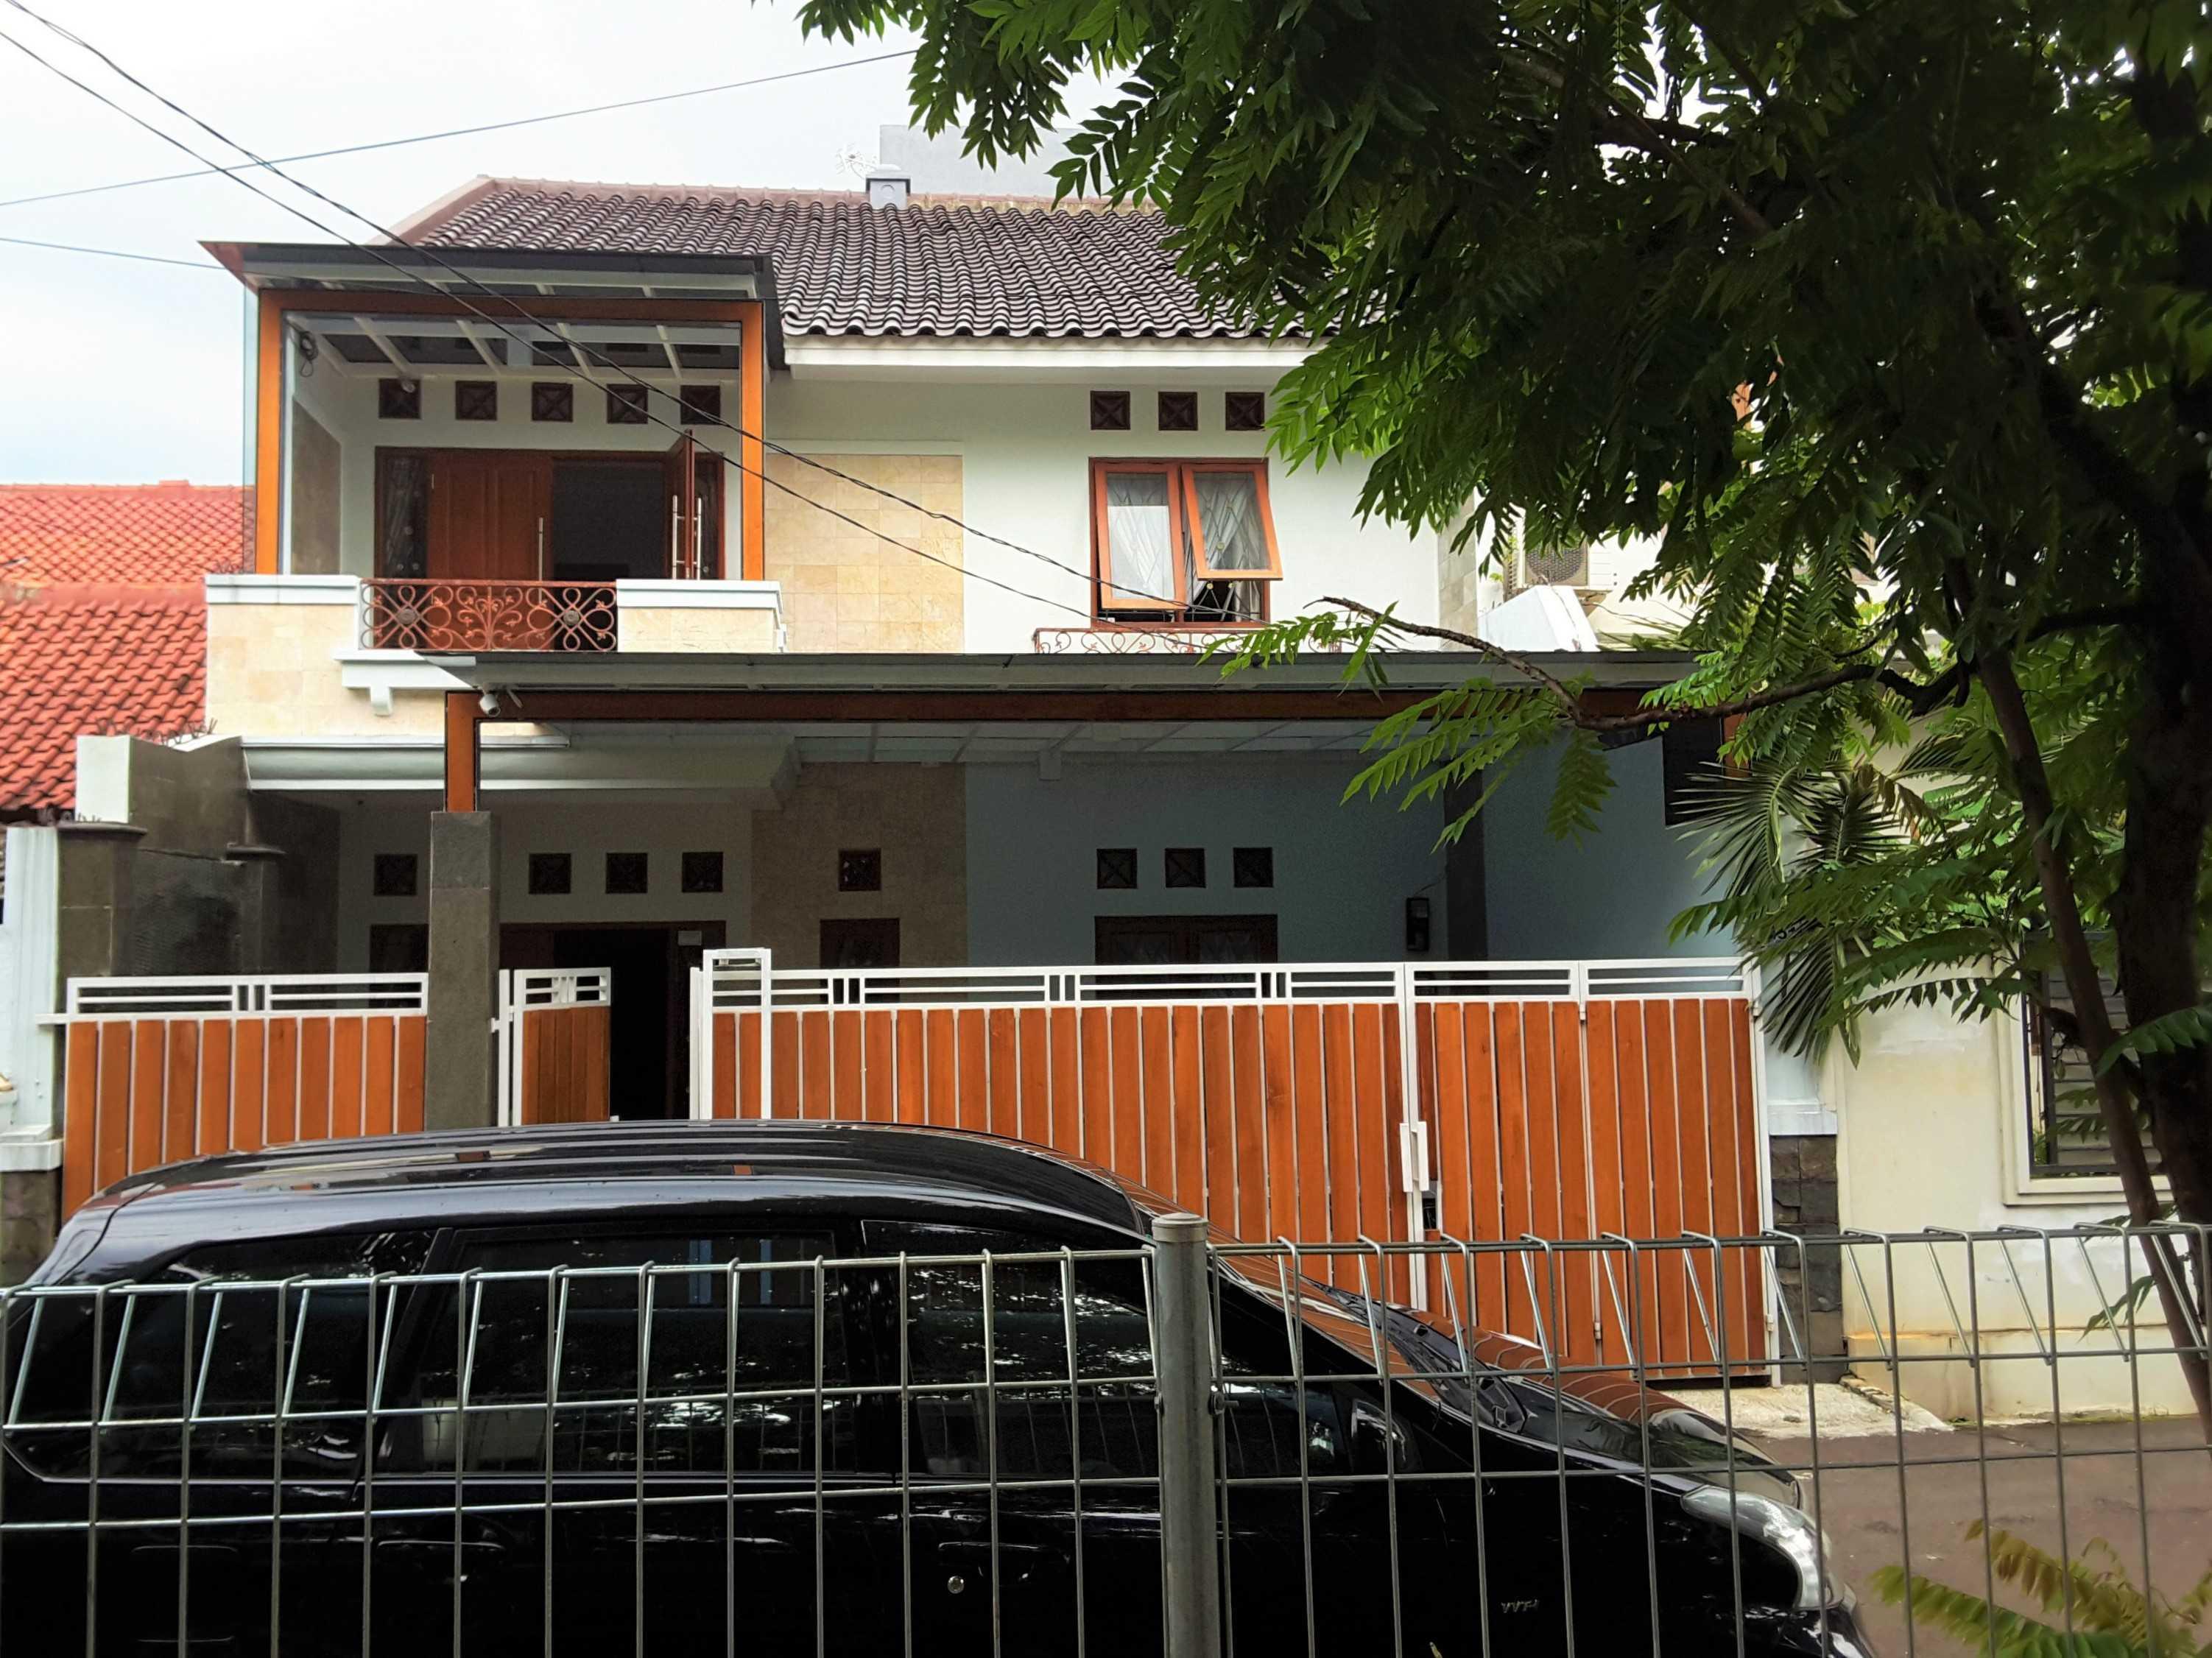 Vaastu Studio     House Park Renovation - Slipi. West Jakarta Slipi . Jakarta Barat - Jakarta . Indonesia Slipi . Jakarta Barat - Jakarta . Indonesia Front View  <P>Tampak Depan Setelah Renovasi</p> 26521